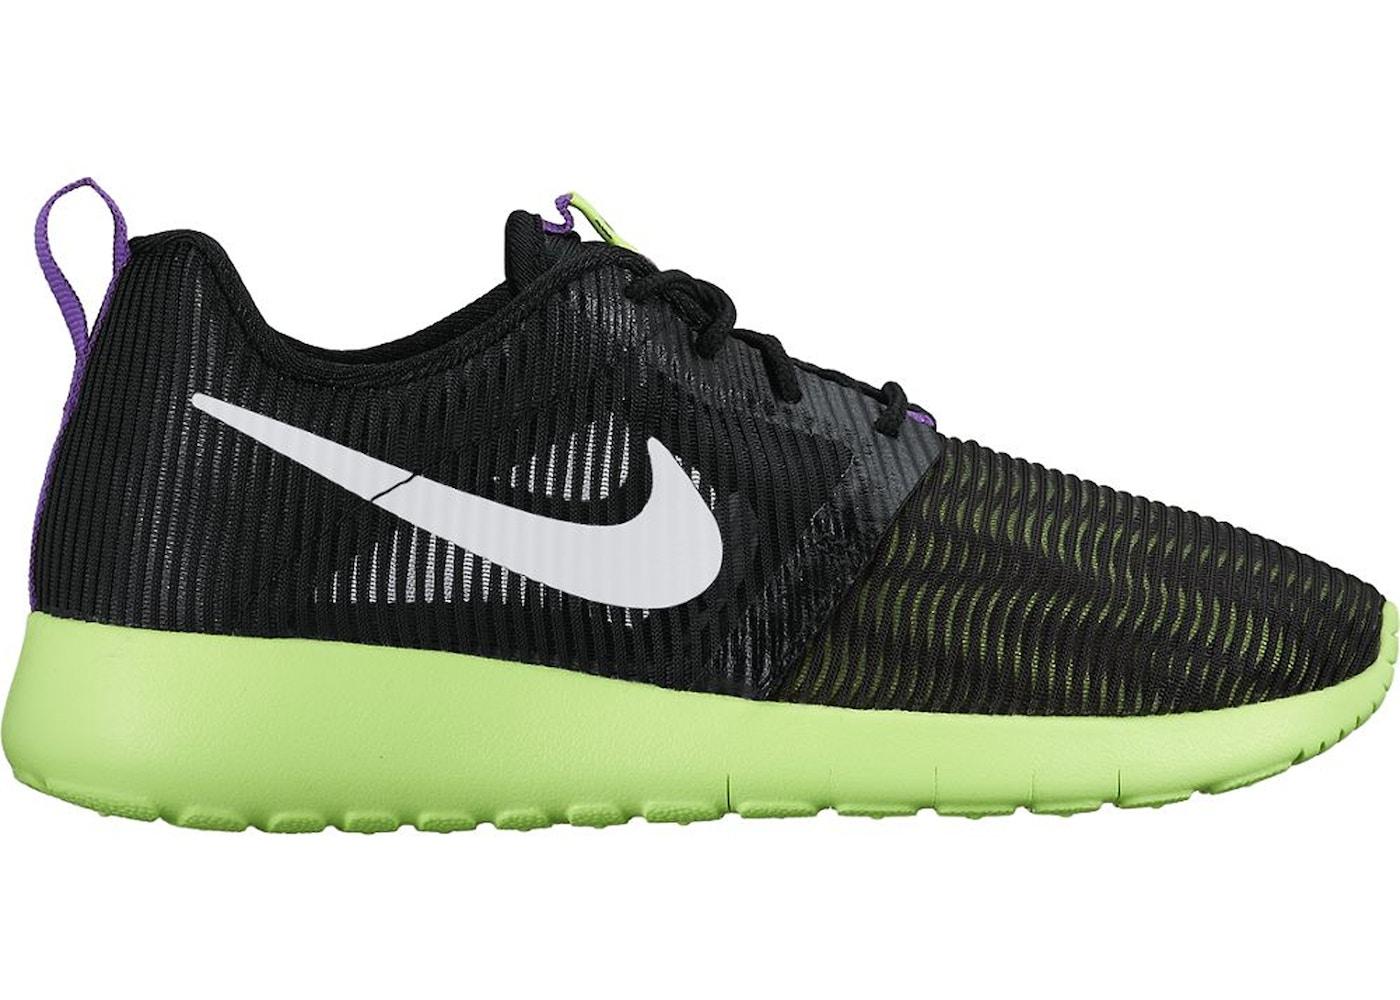 super popular 323ad 05d5e Nike Roshe One Flight Weight Black Ghost Green (GS) - 705486-003